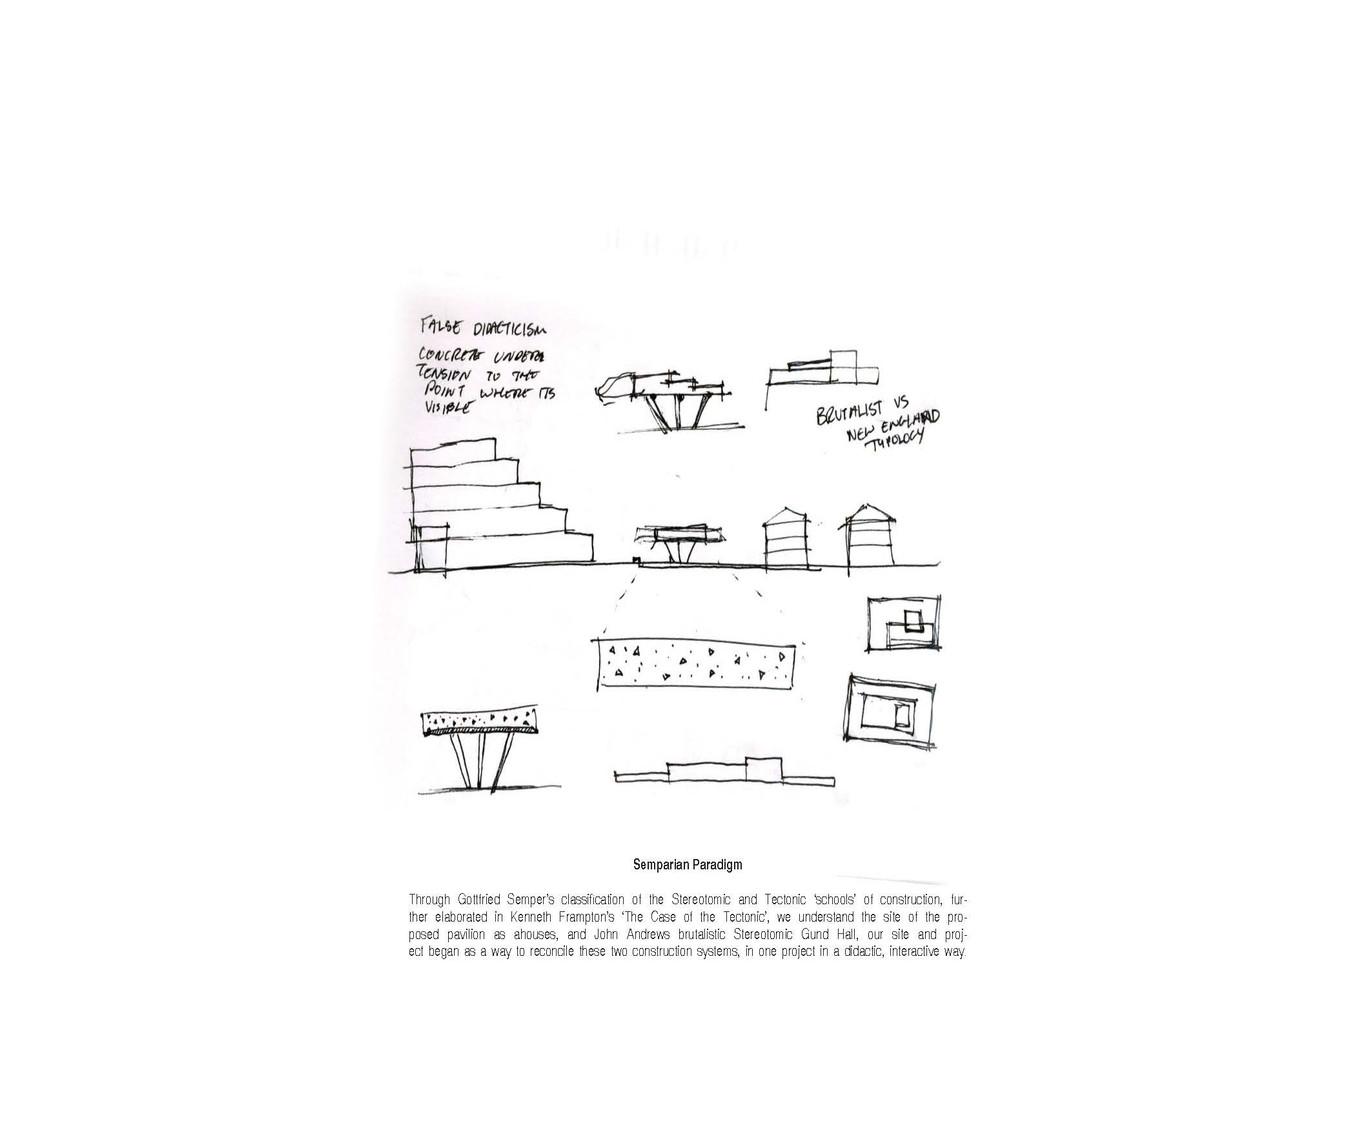 160511-MASTER-jongman-sereno_mohr_final_